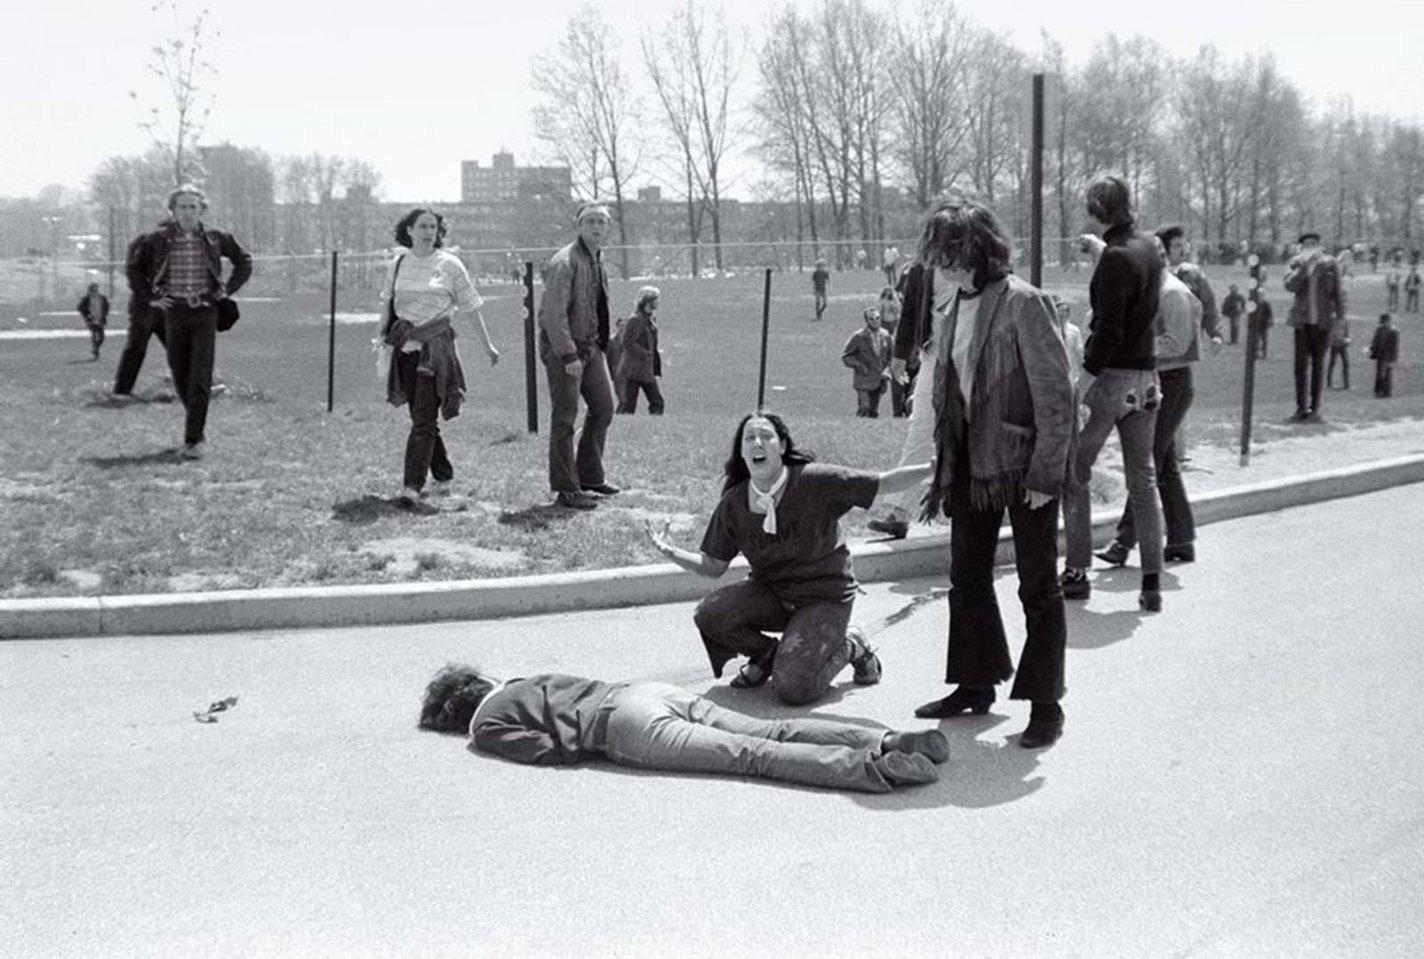 Kent State Shootings, John Paul Filo, 1970